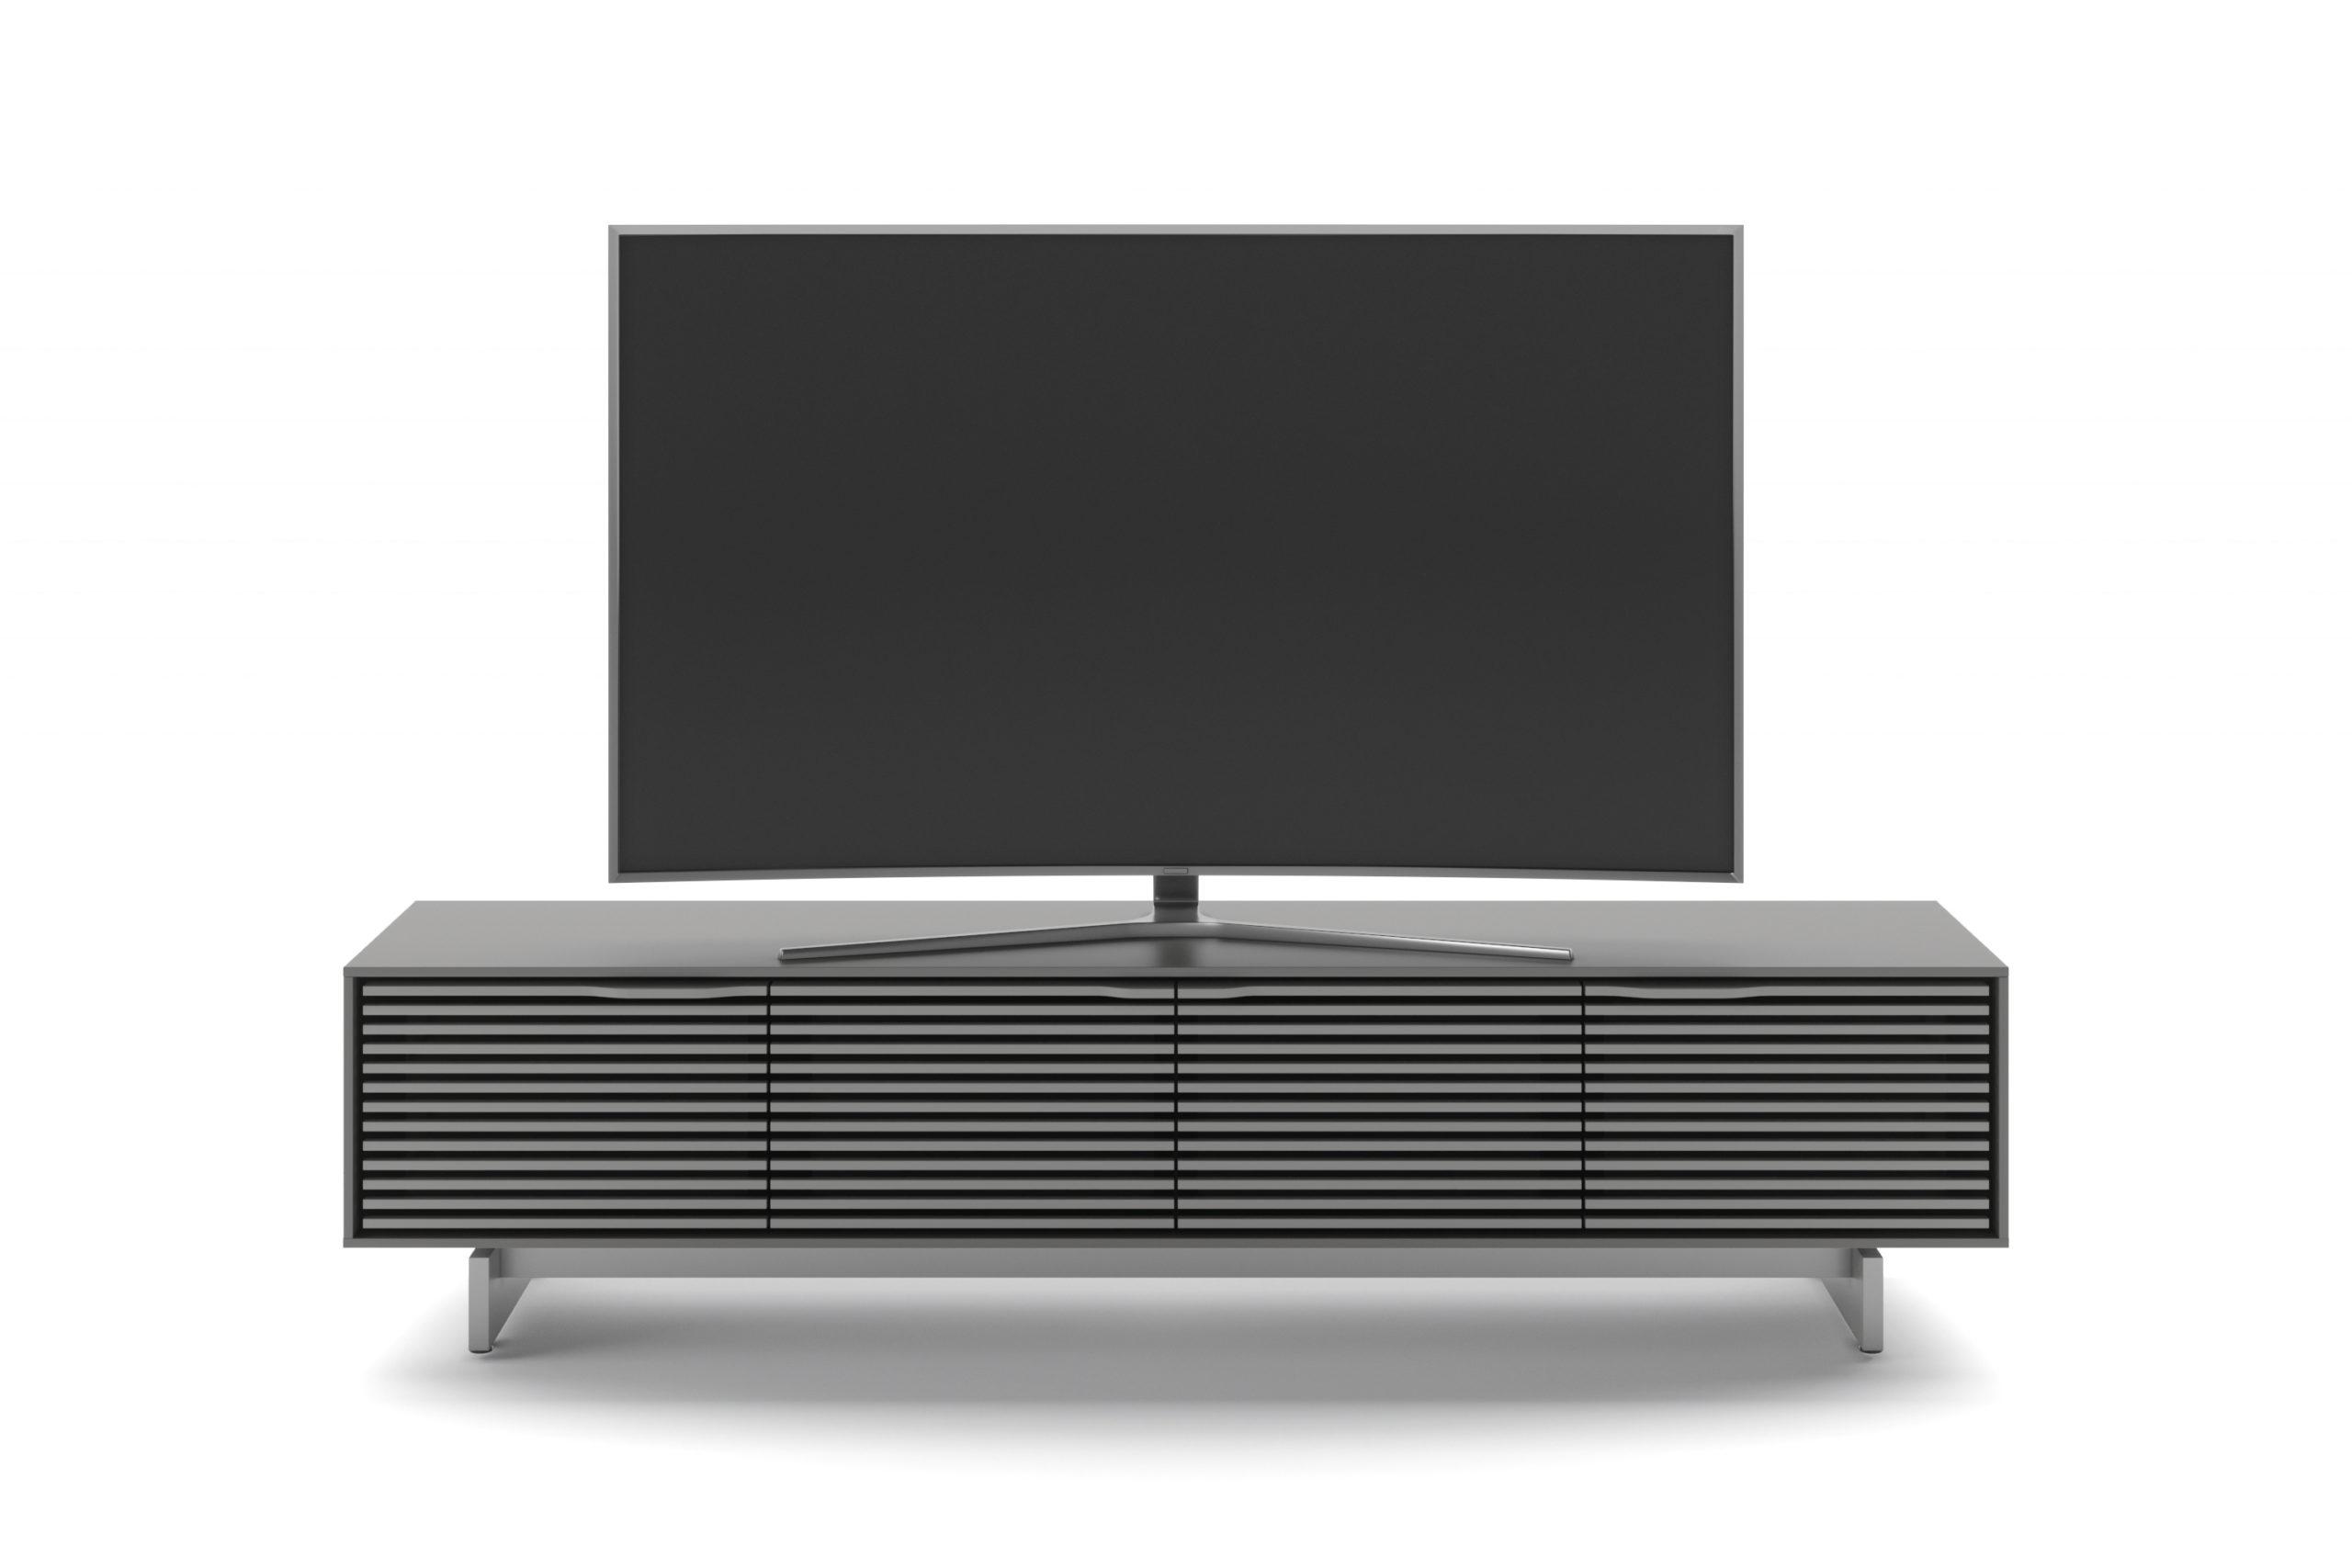 Align 7473 Modern TV Stand & Credenza | BDI Furniture